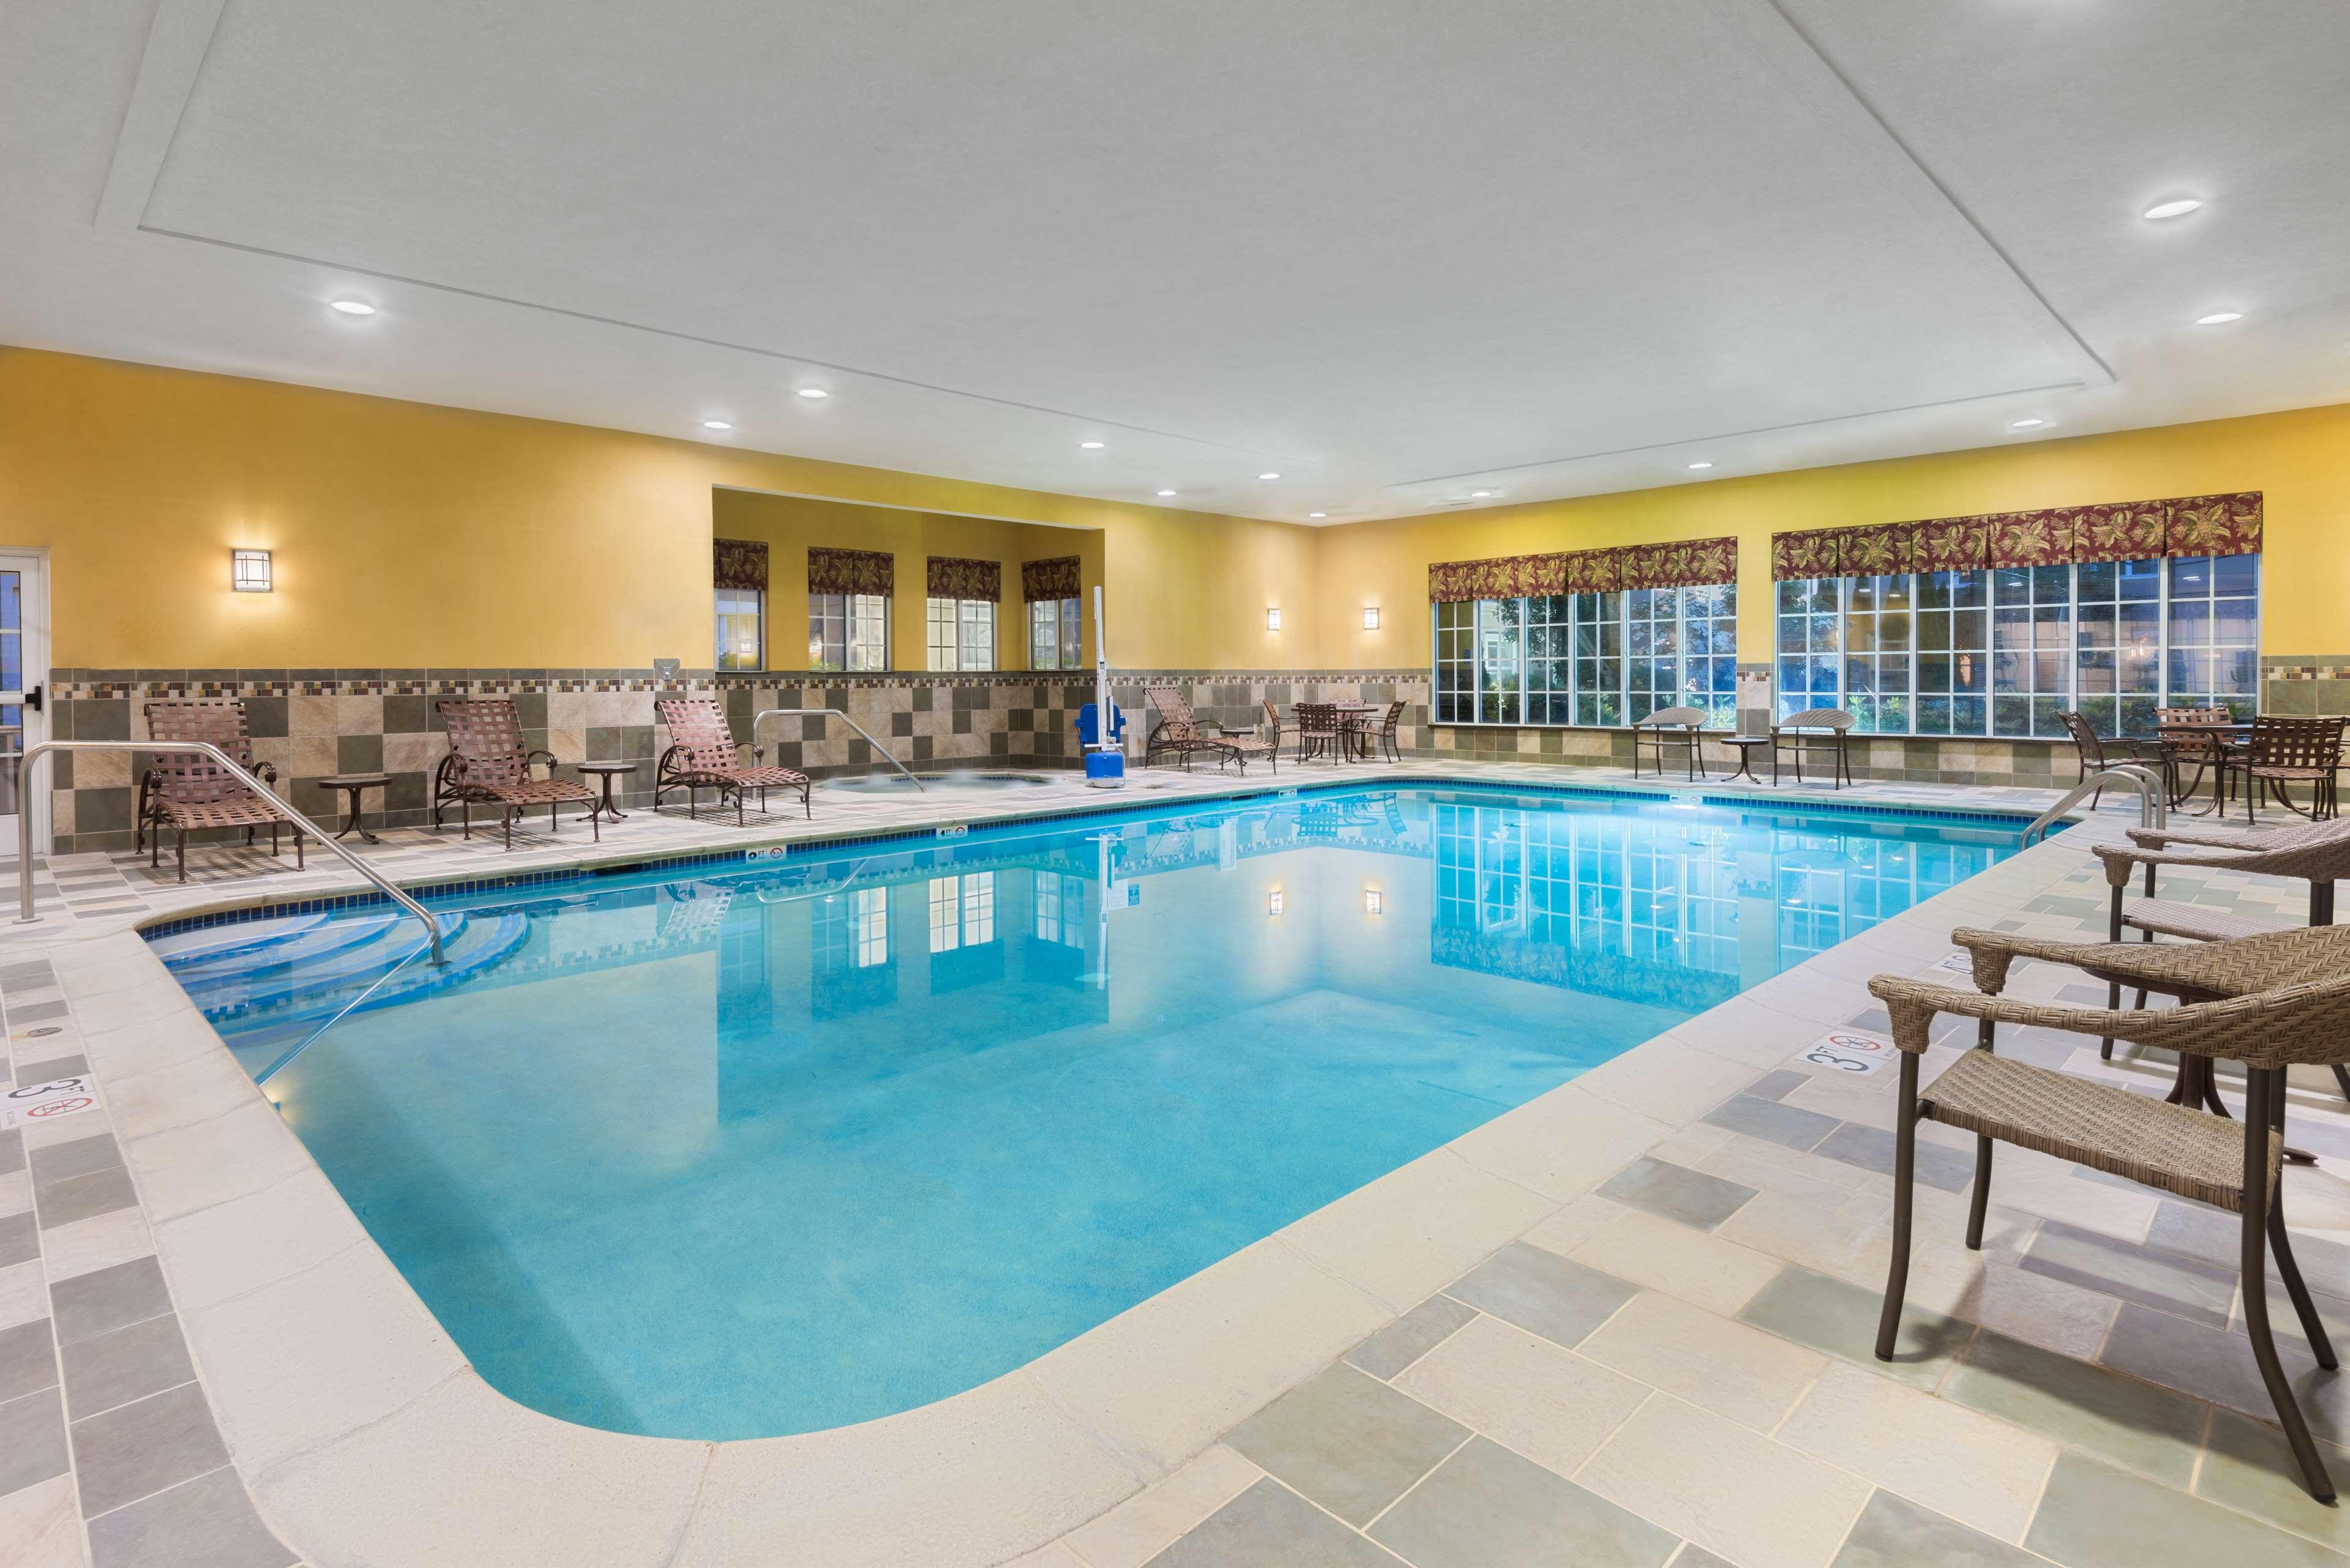 Homewood Suites by Hilton Holyoke-Springfield/North image 5